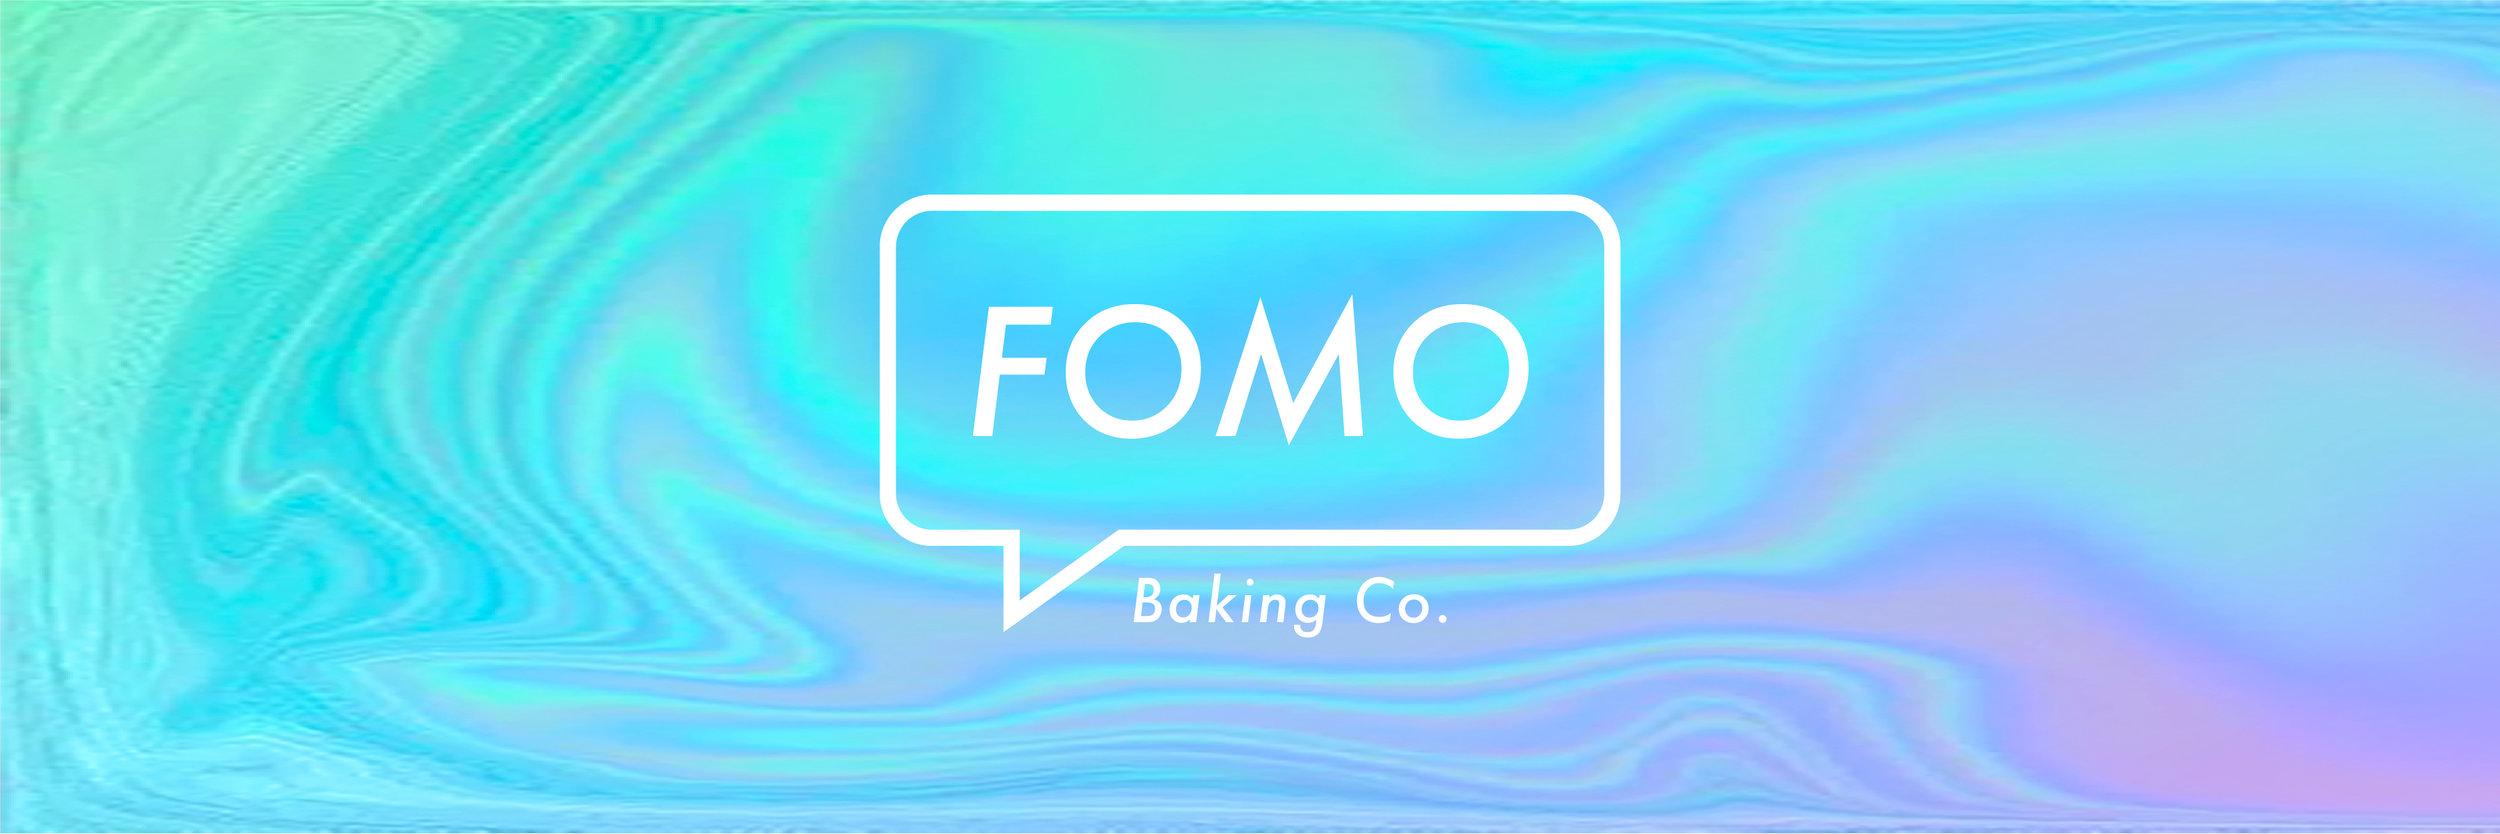 FOMO-Box-Layouts-15.jpg